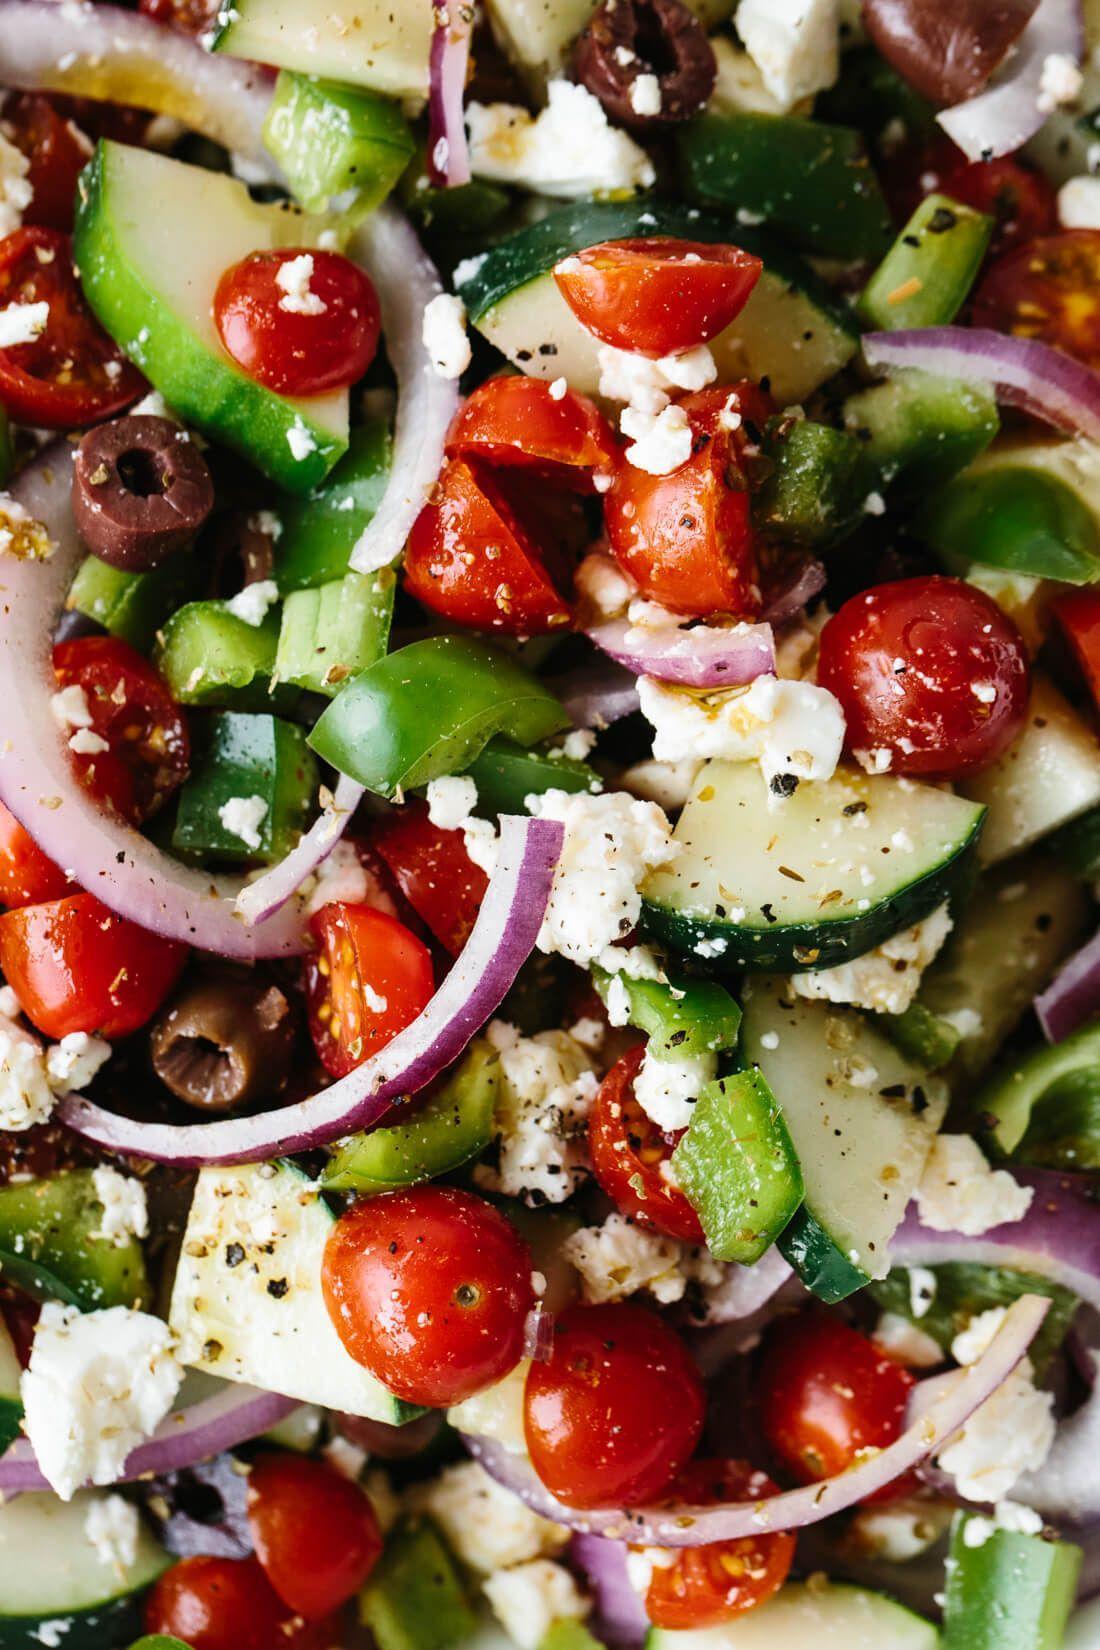 Griechischer Salat (das klassische Rezept) | Downshiftologie